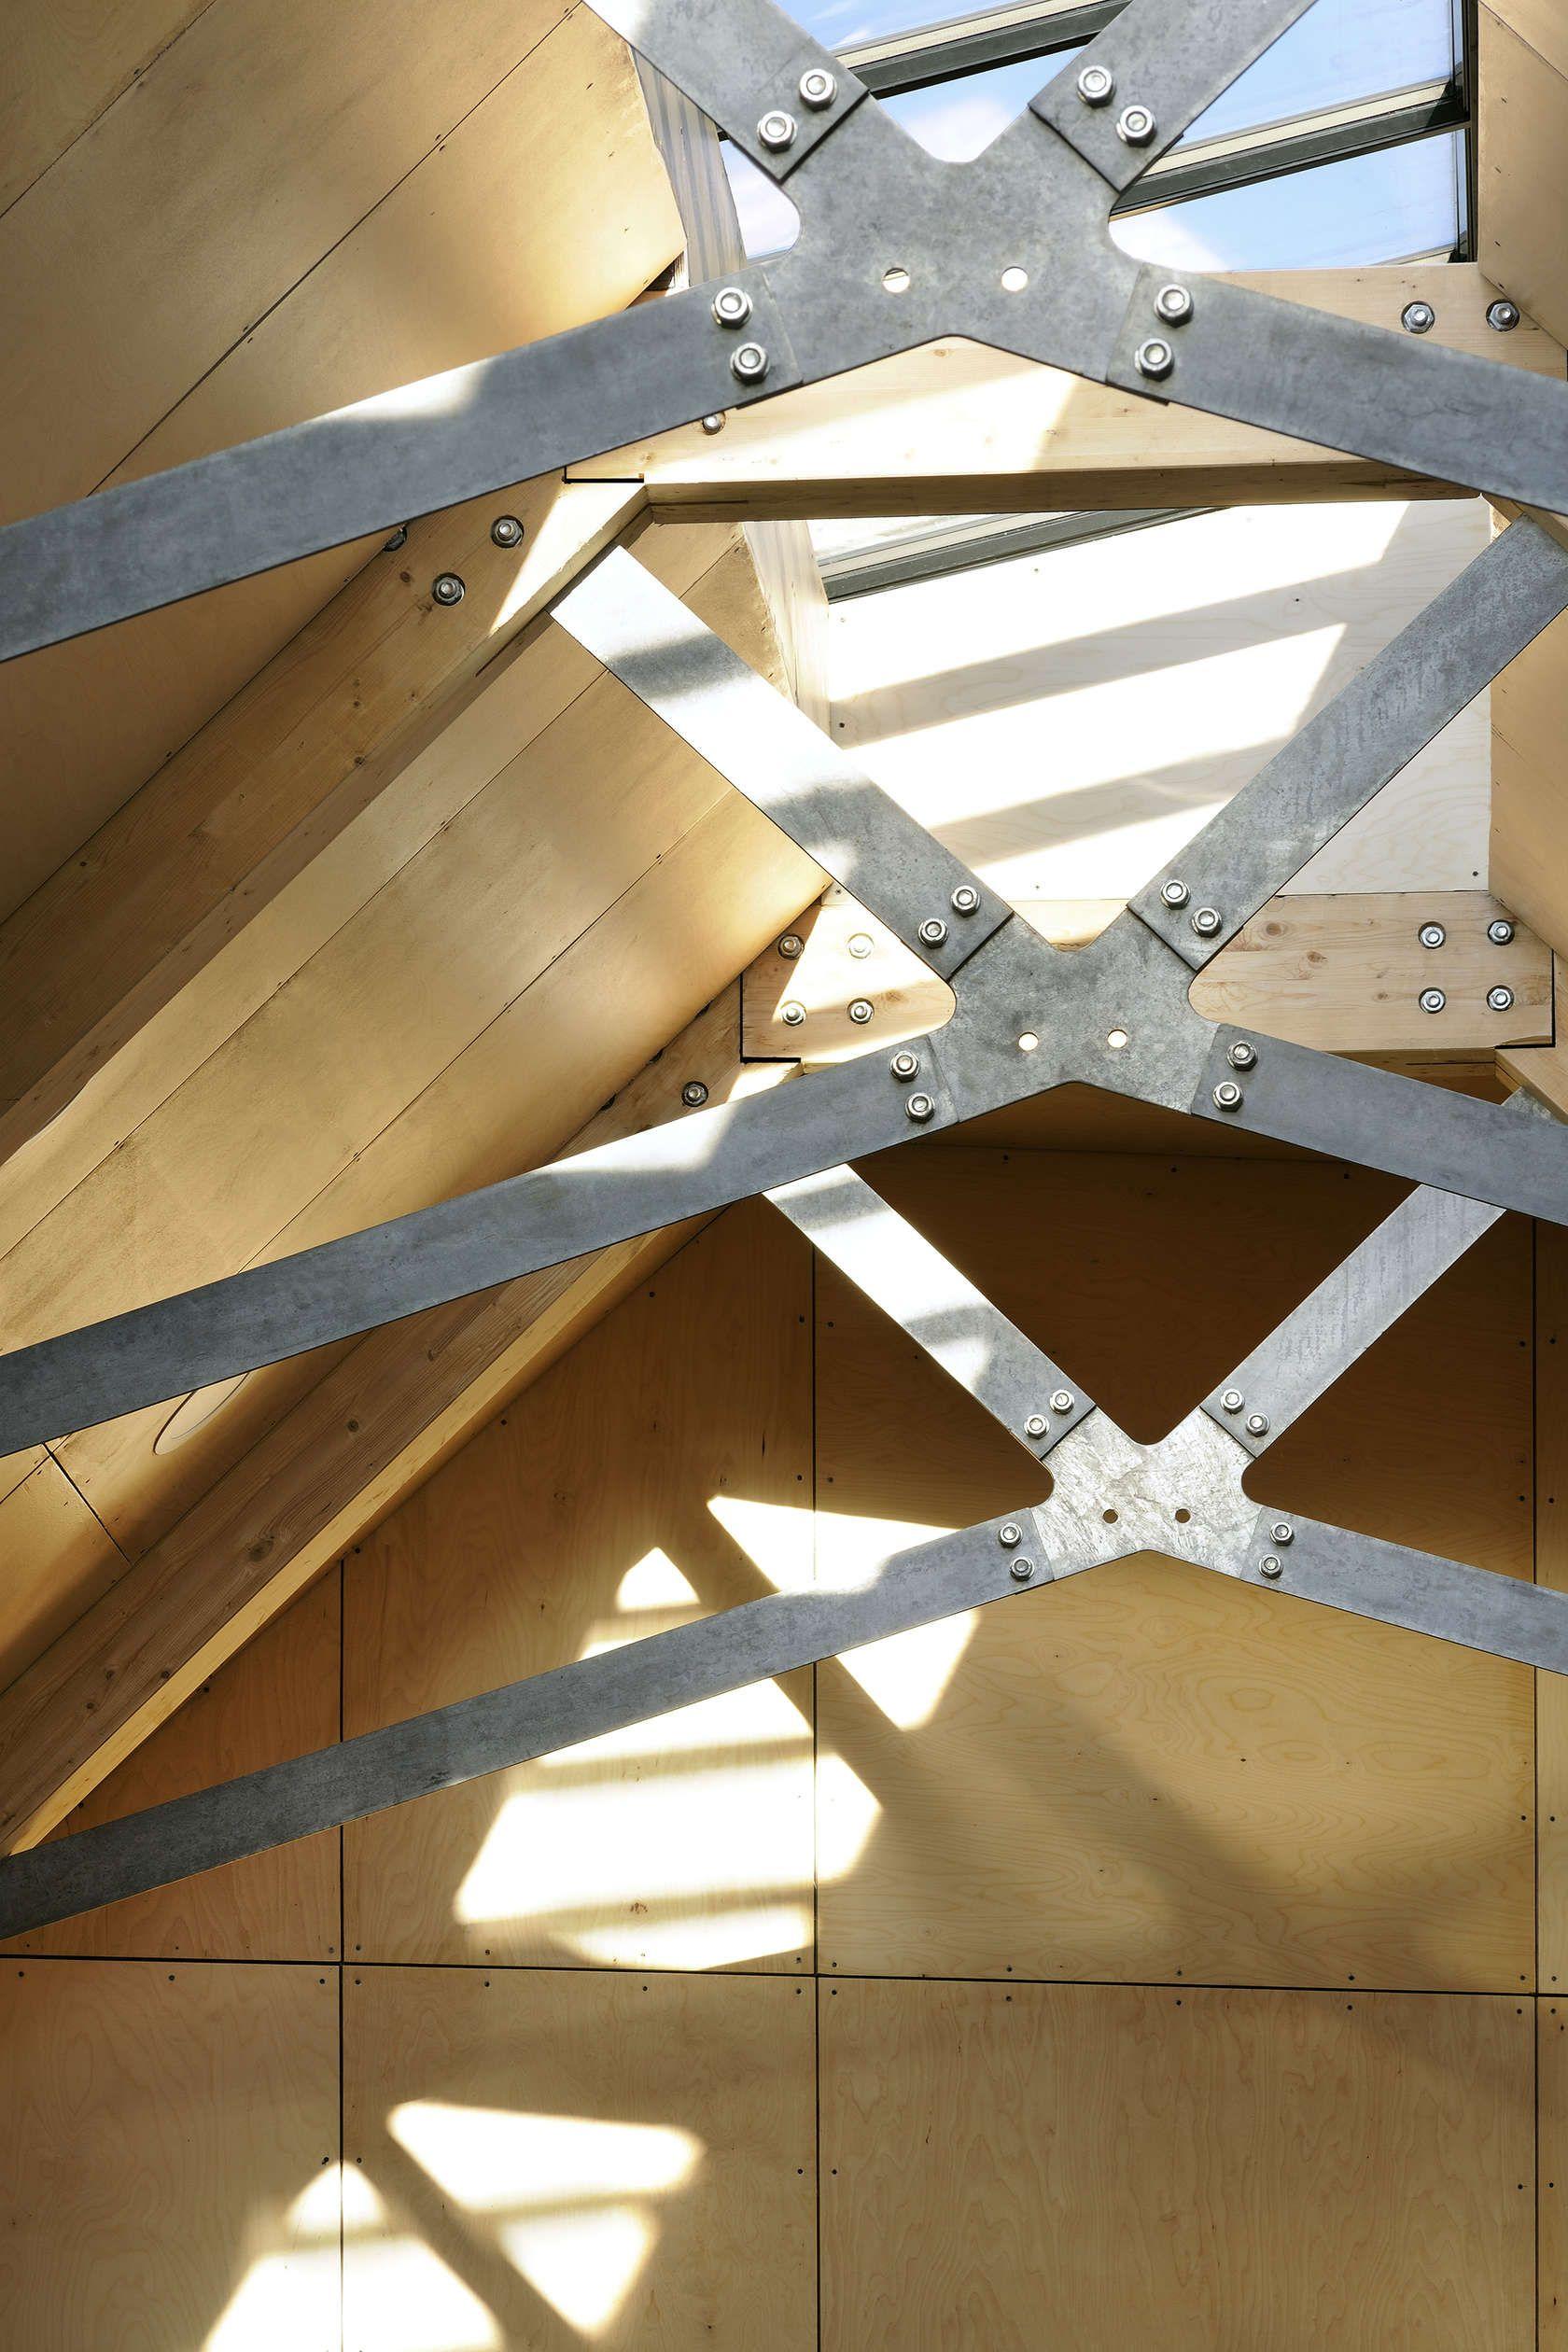 Portsoy Boatbuilding Centre Steel Trusses Roof Construction Building Design